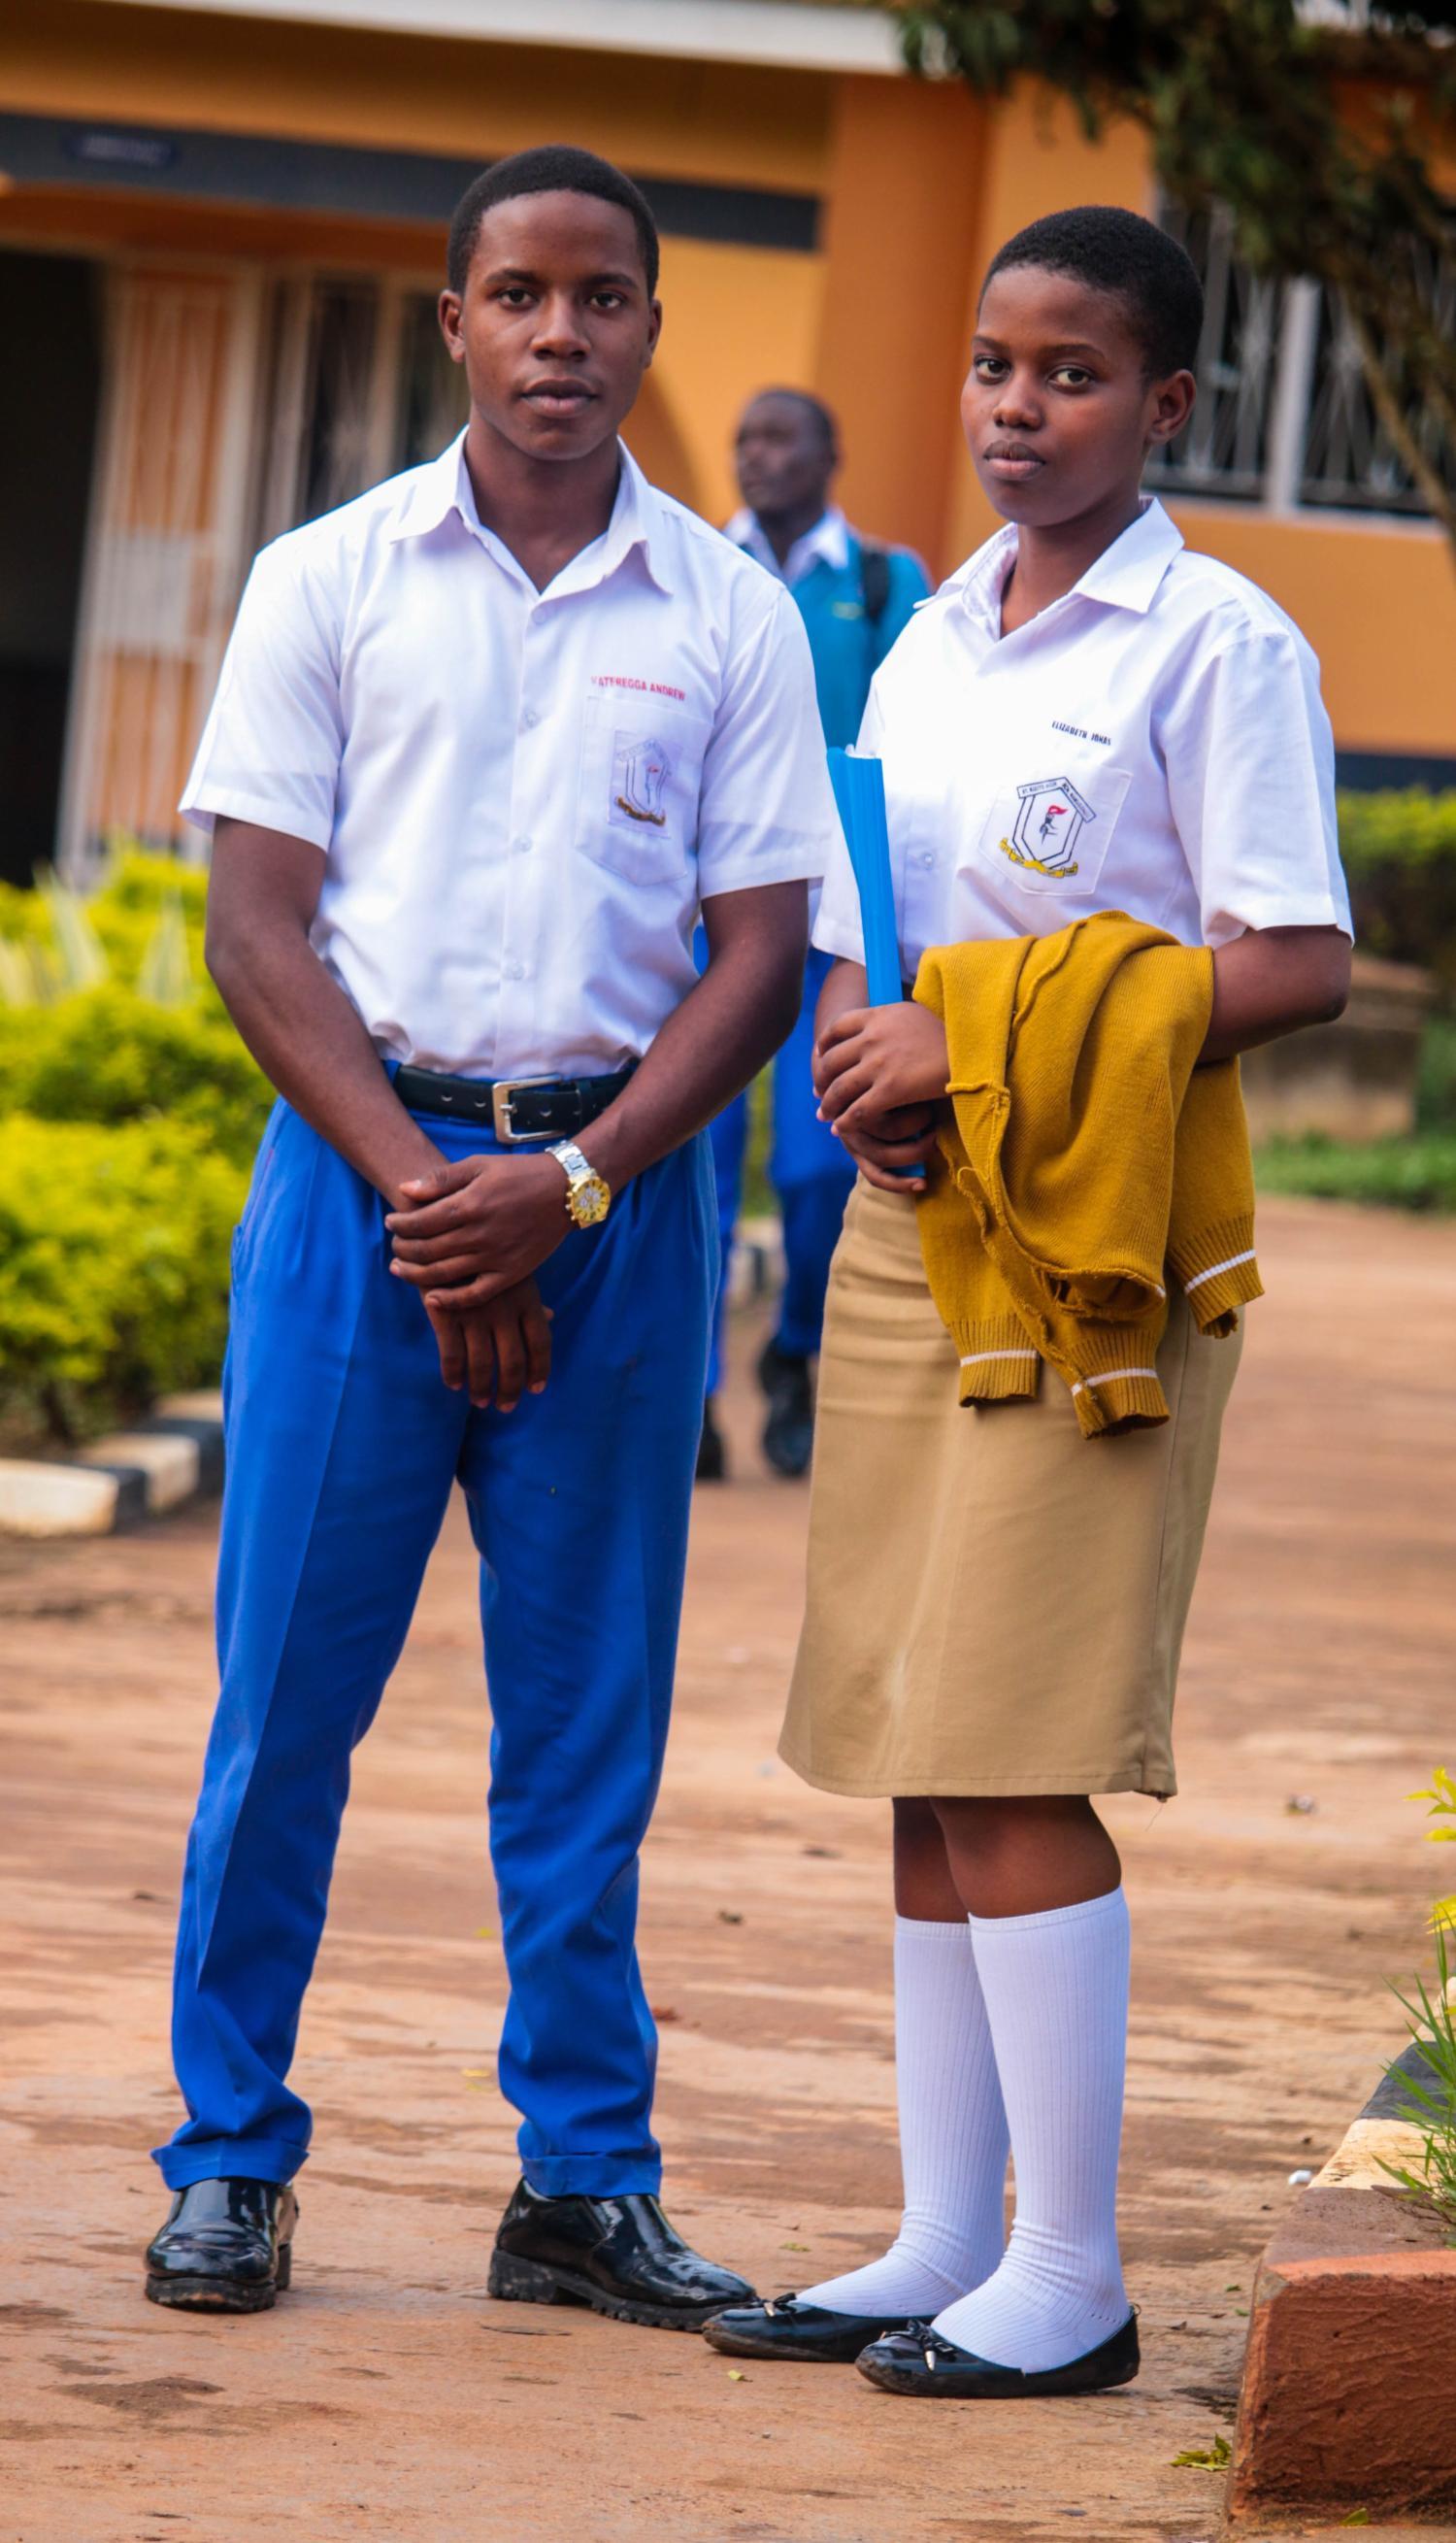 st Kizito namugongo students